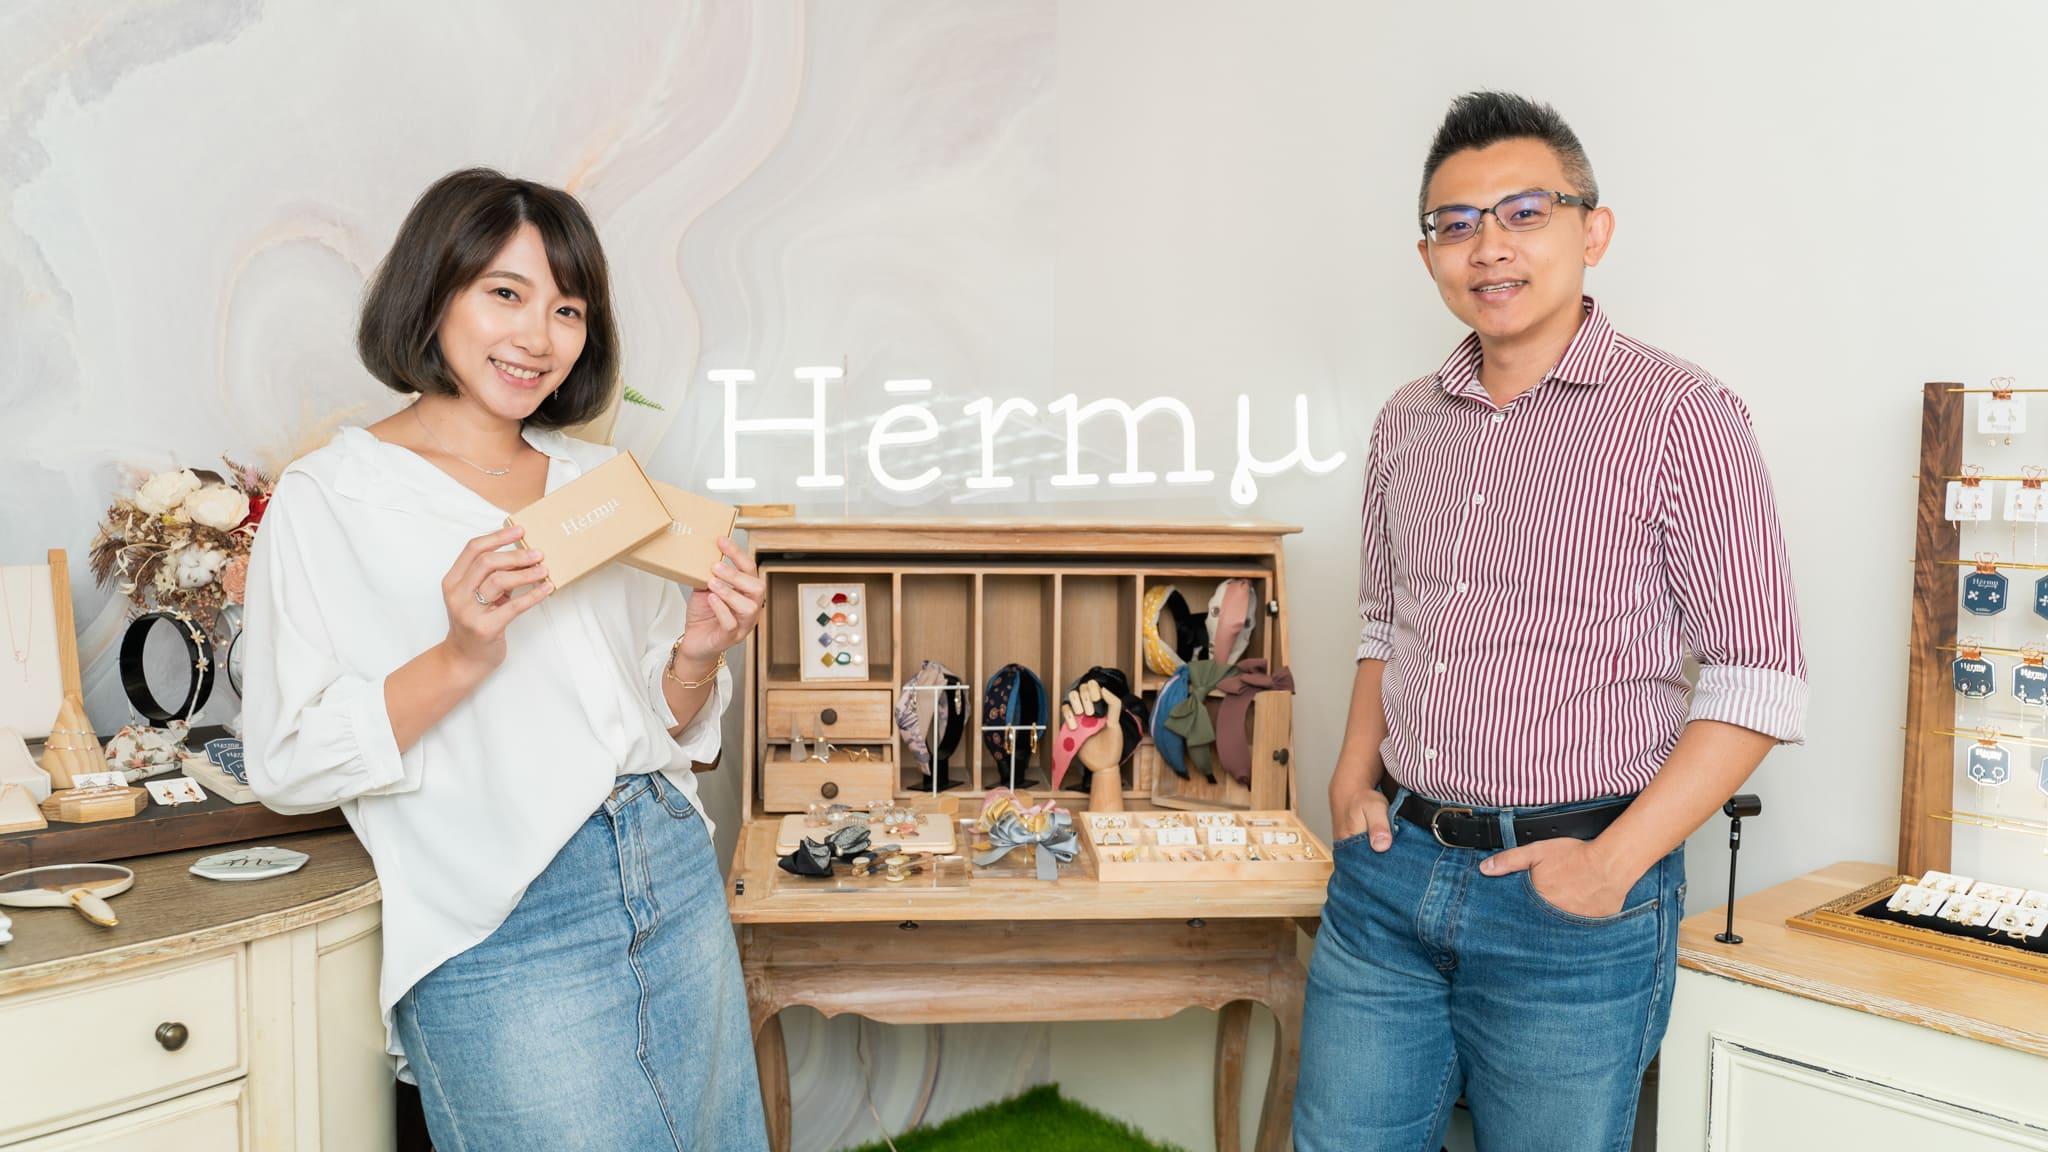 Hermu 法式飾品:突破專櫃撞牆期,靠虛實融合創造新零售爆發成長